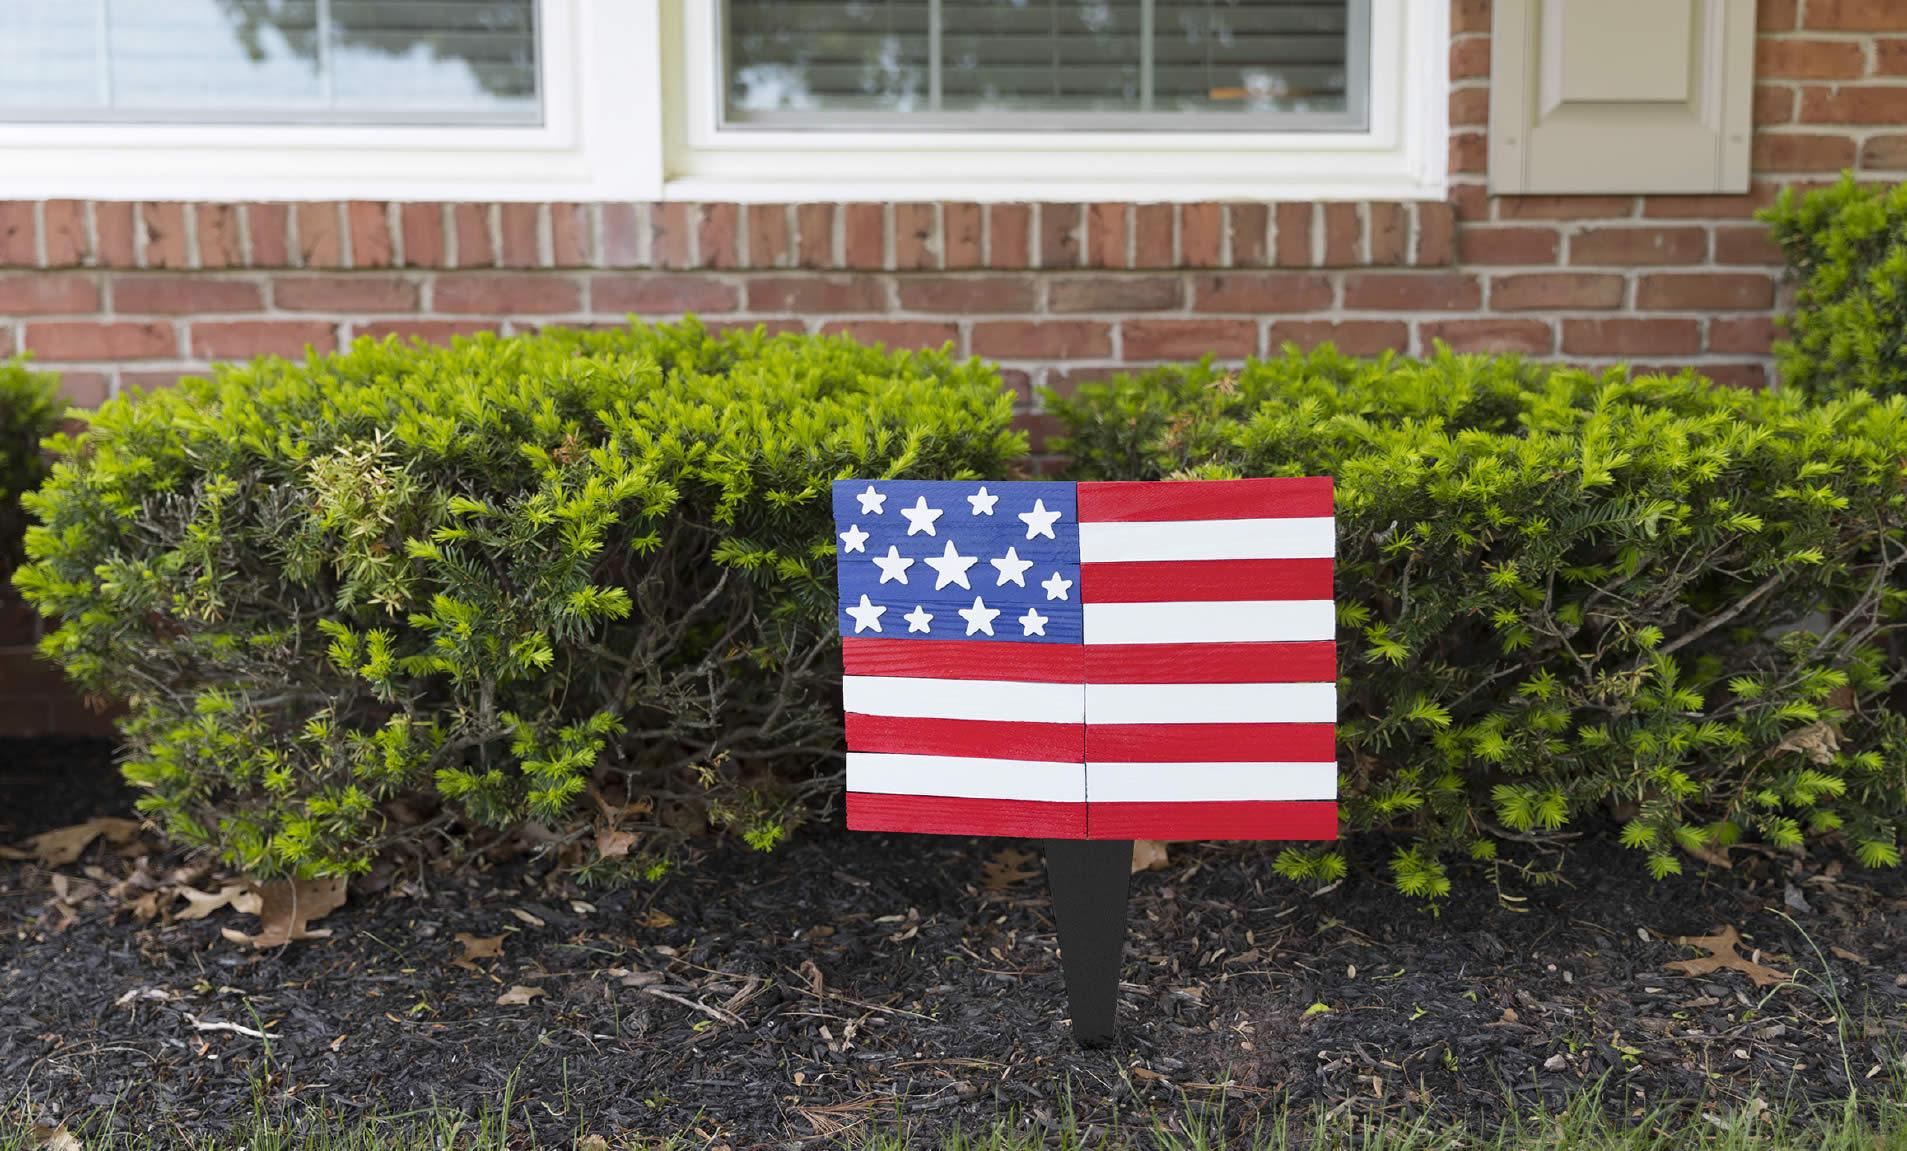 outdoor homemade usa flag